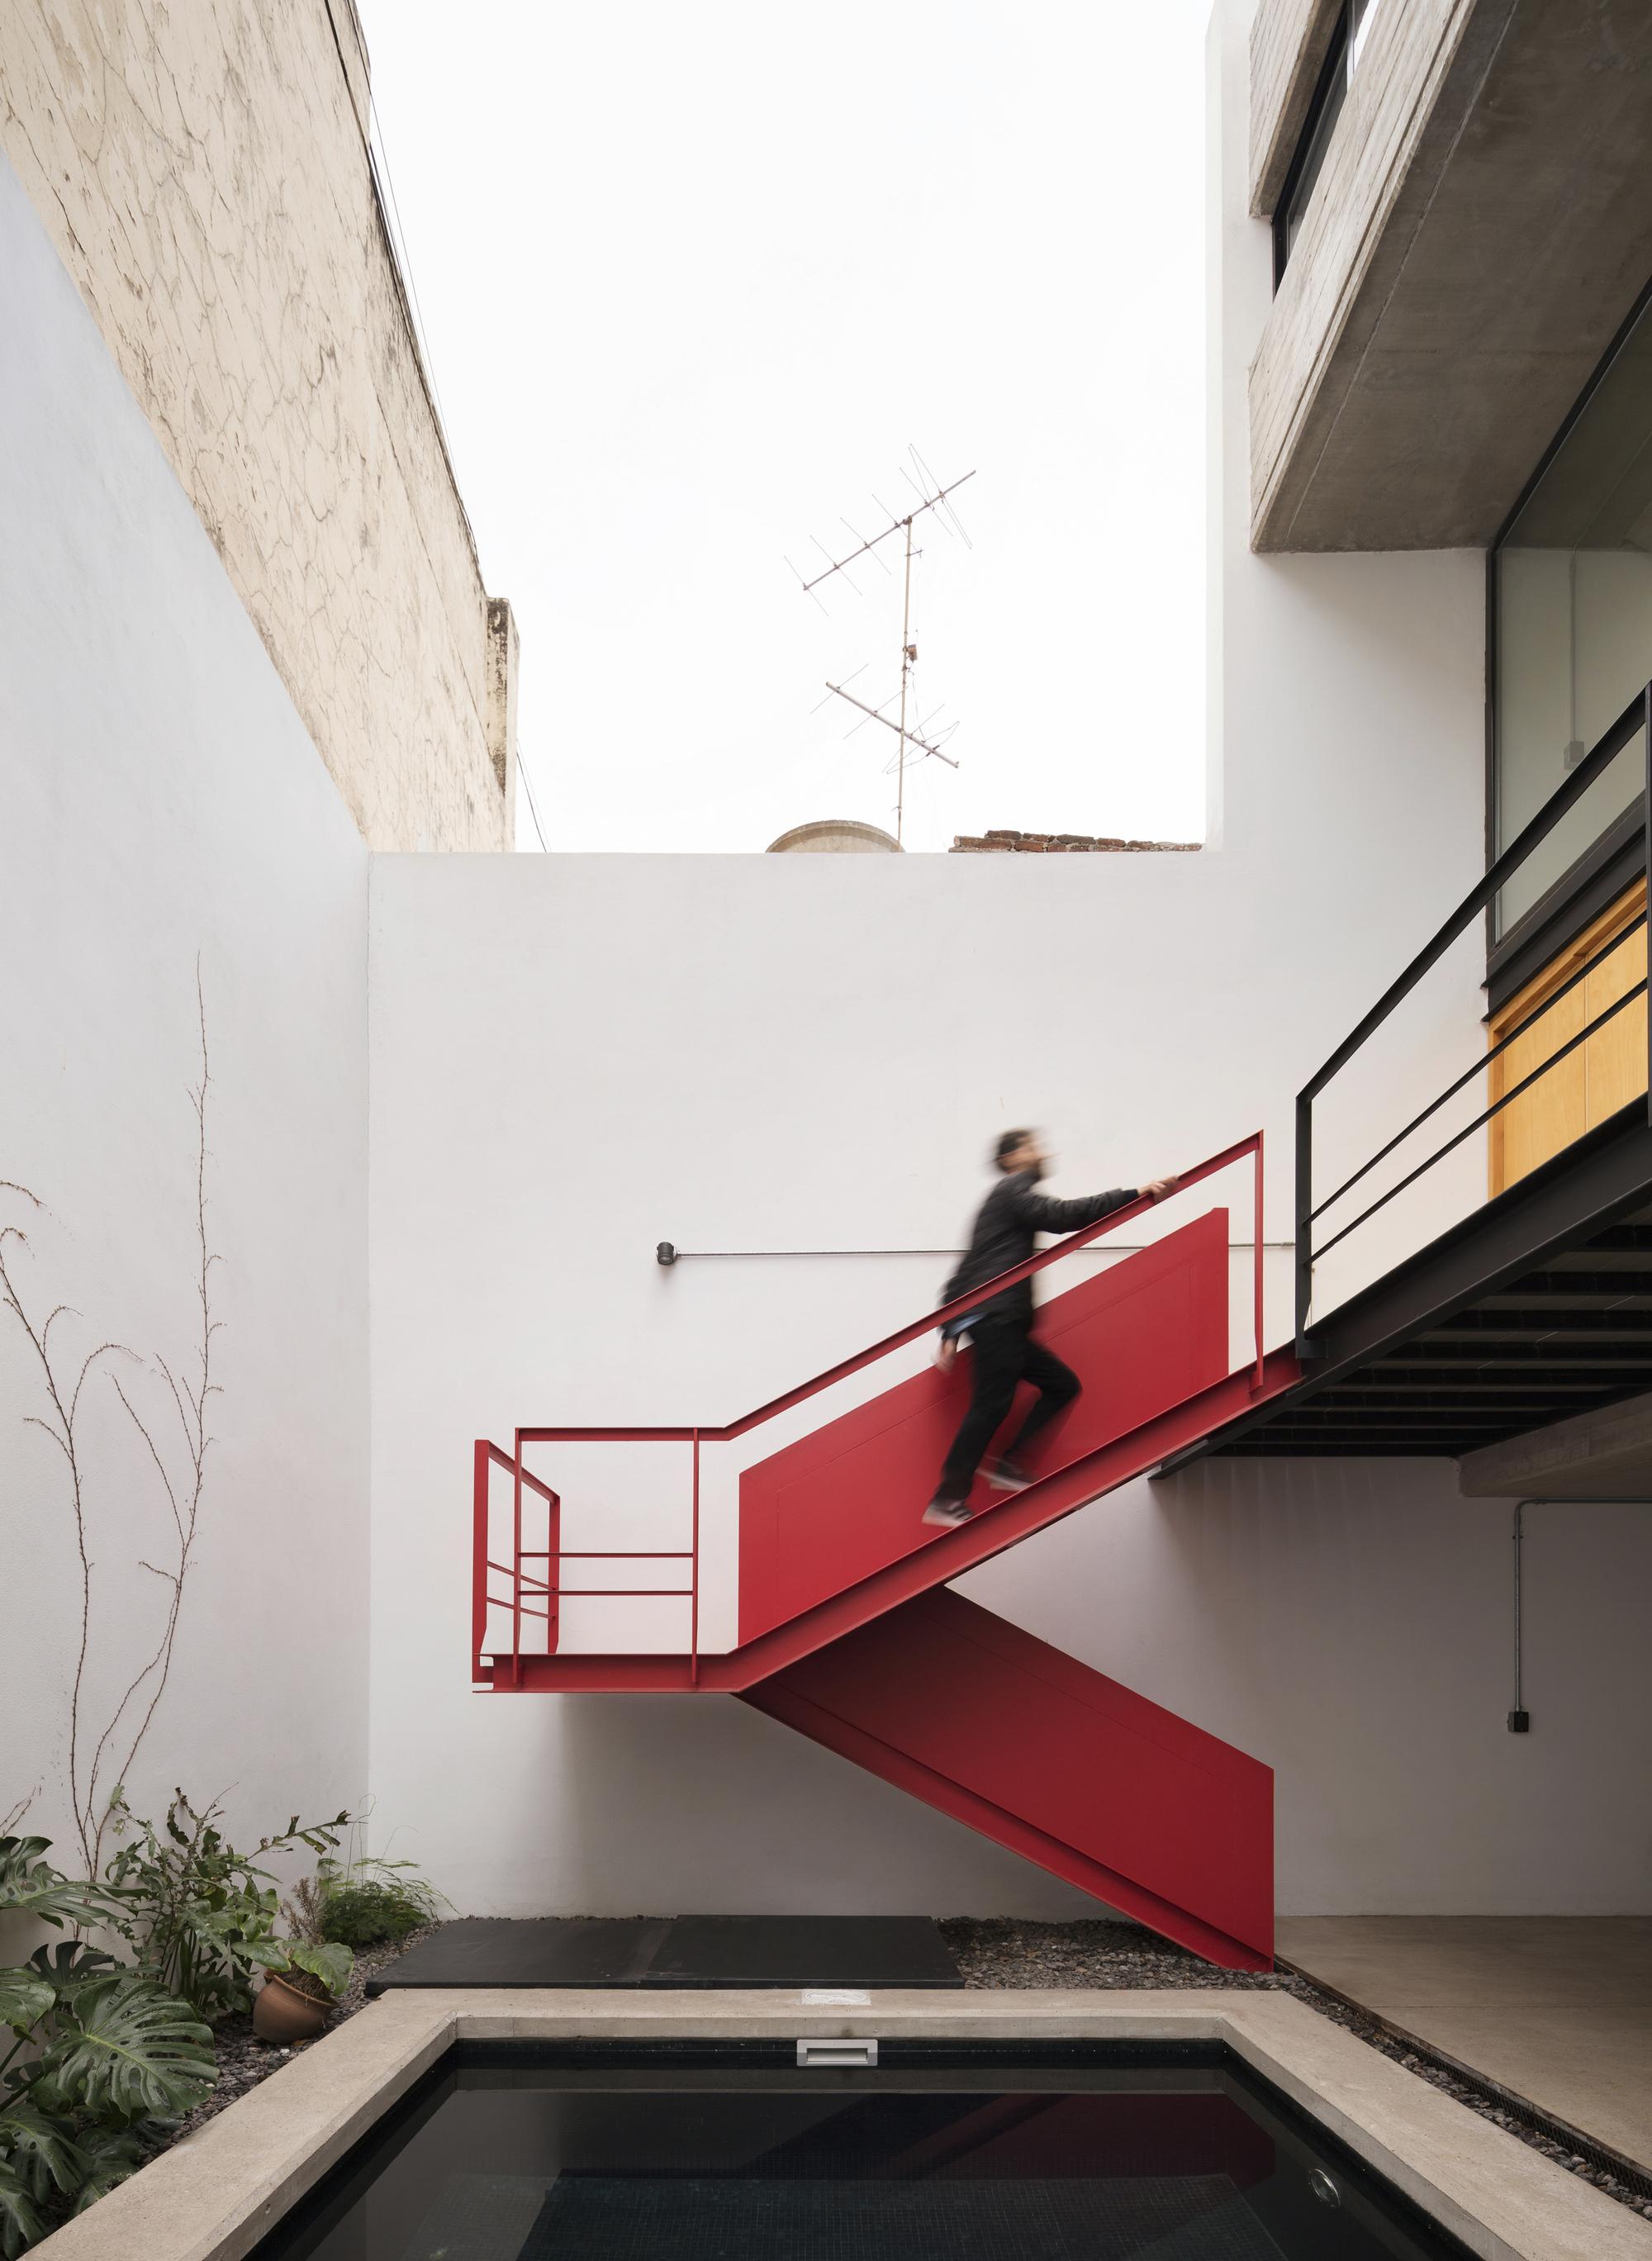 Galeria de Residência FL / Berzero Jaros - 5